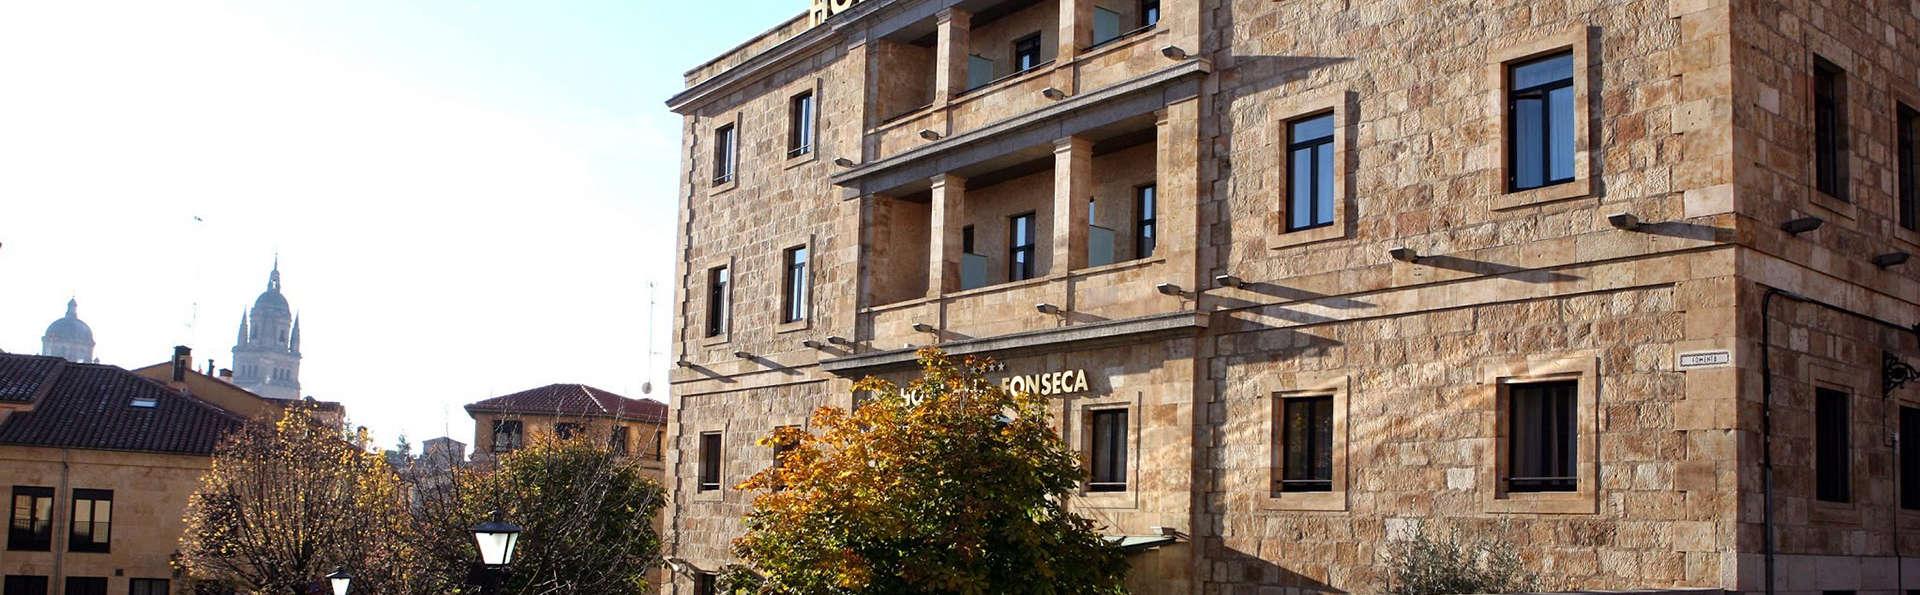 Abba Fonseca Hotel - EDIT_front.jpg